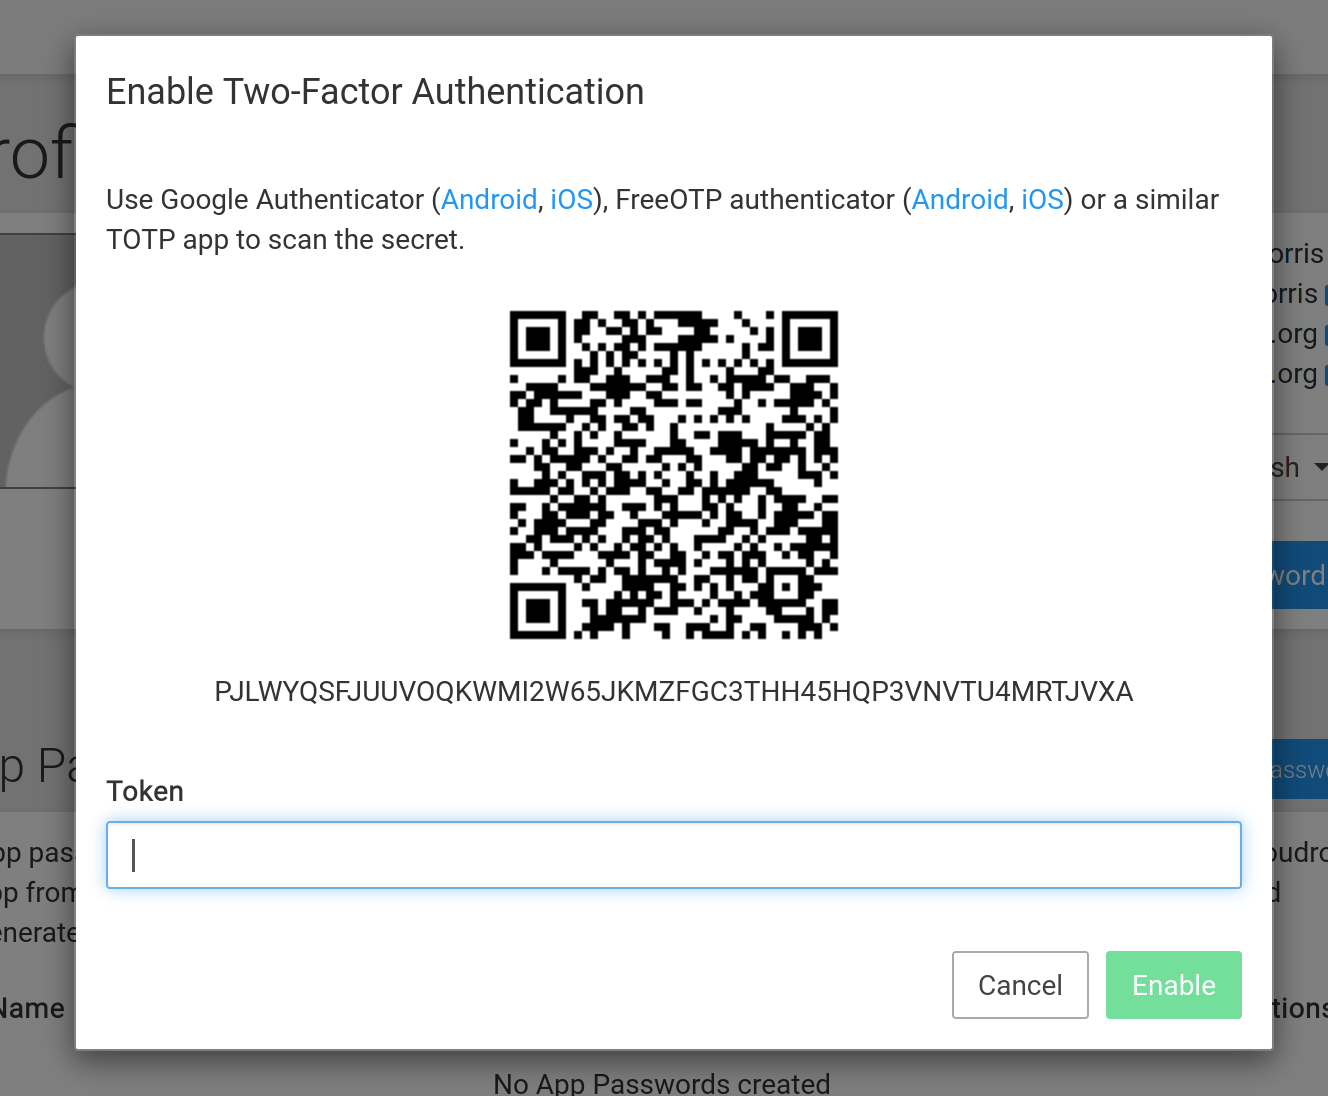 2fa settings in cloudron - screenshot